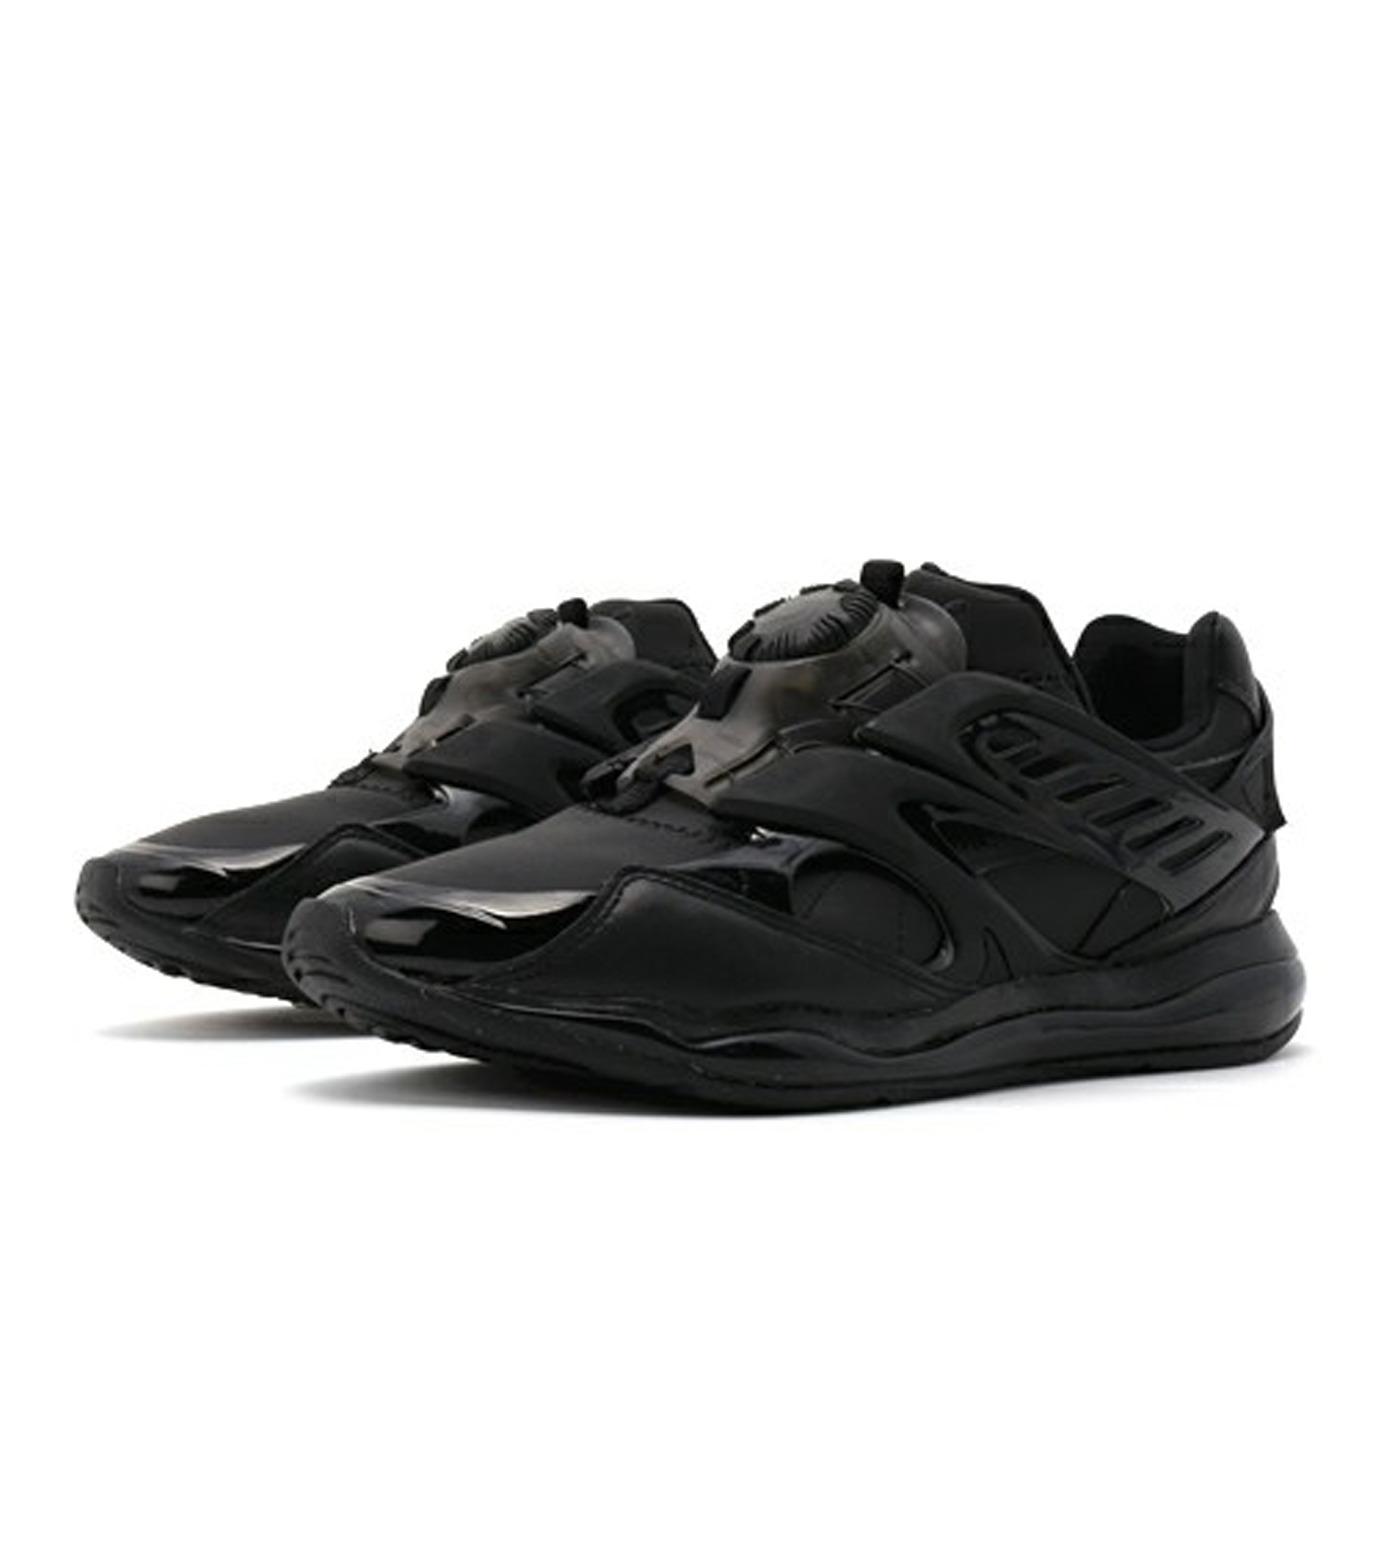 PUMA(プーマ)のDISC BLAZE CELL-BLACK(シューズ/shoes)-360078-13 拡大詳細画像3